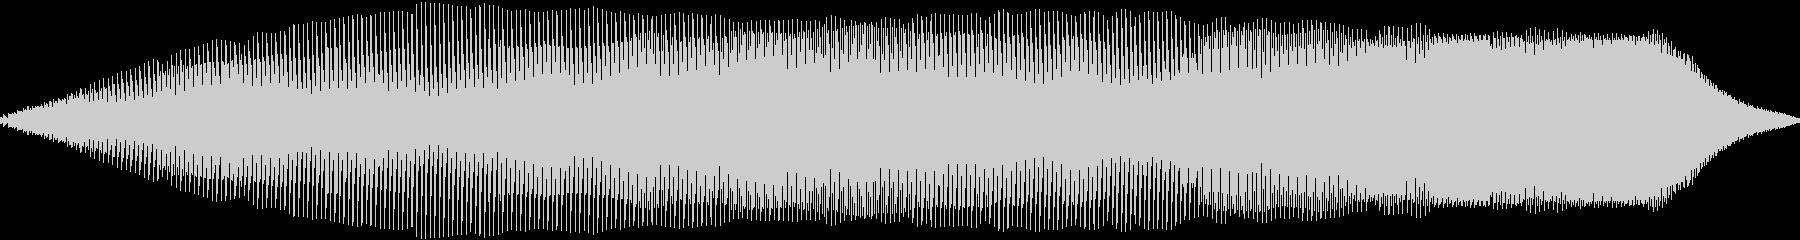 Putney 1603 ZGの未再生の波形